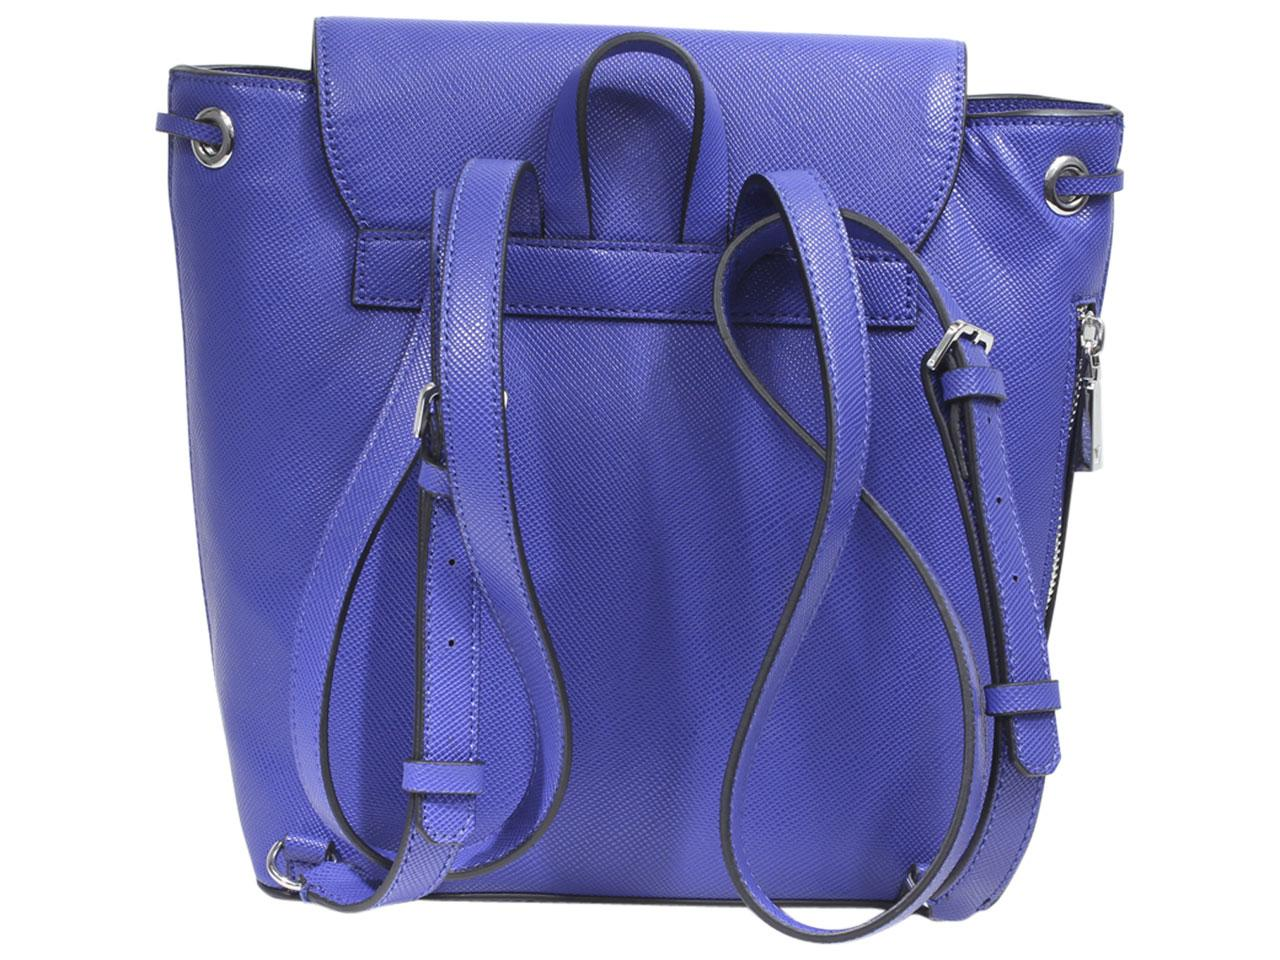 Guess-Women-039-s-Varsity-Pop-Pin-Up-Backpack-Bag thumbnail 13